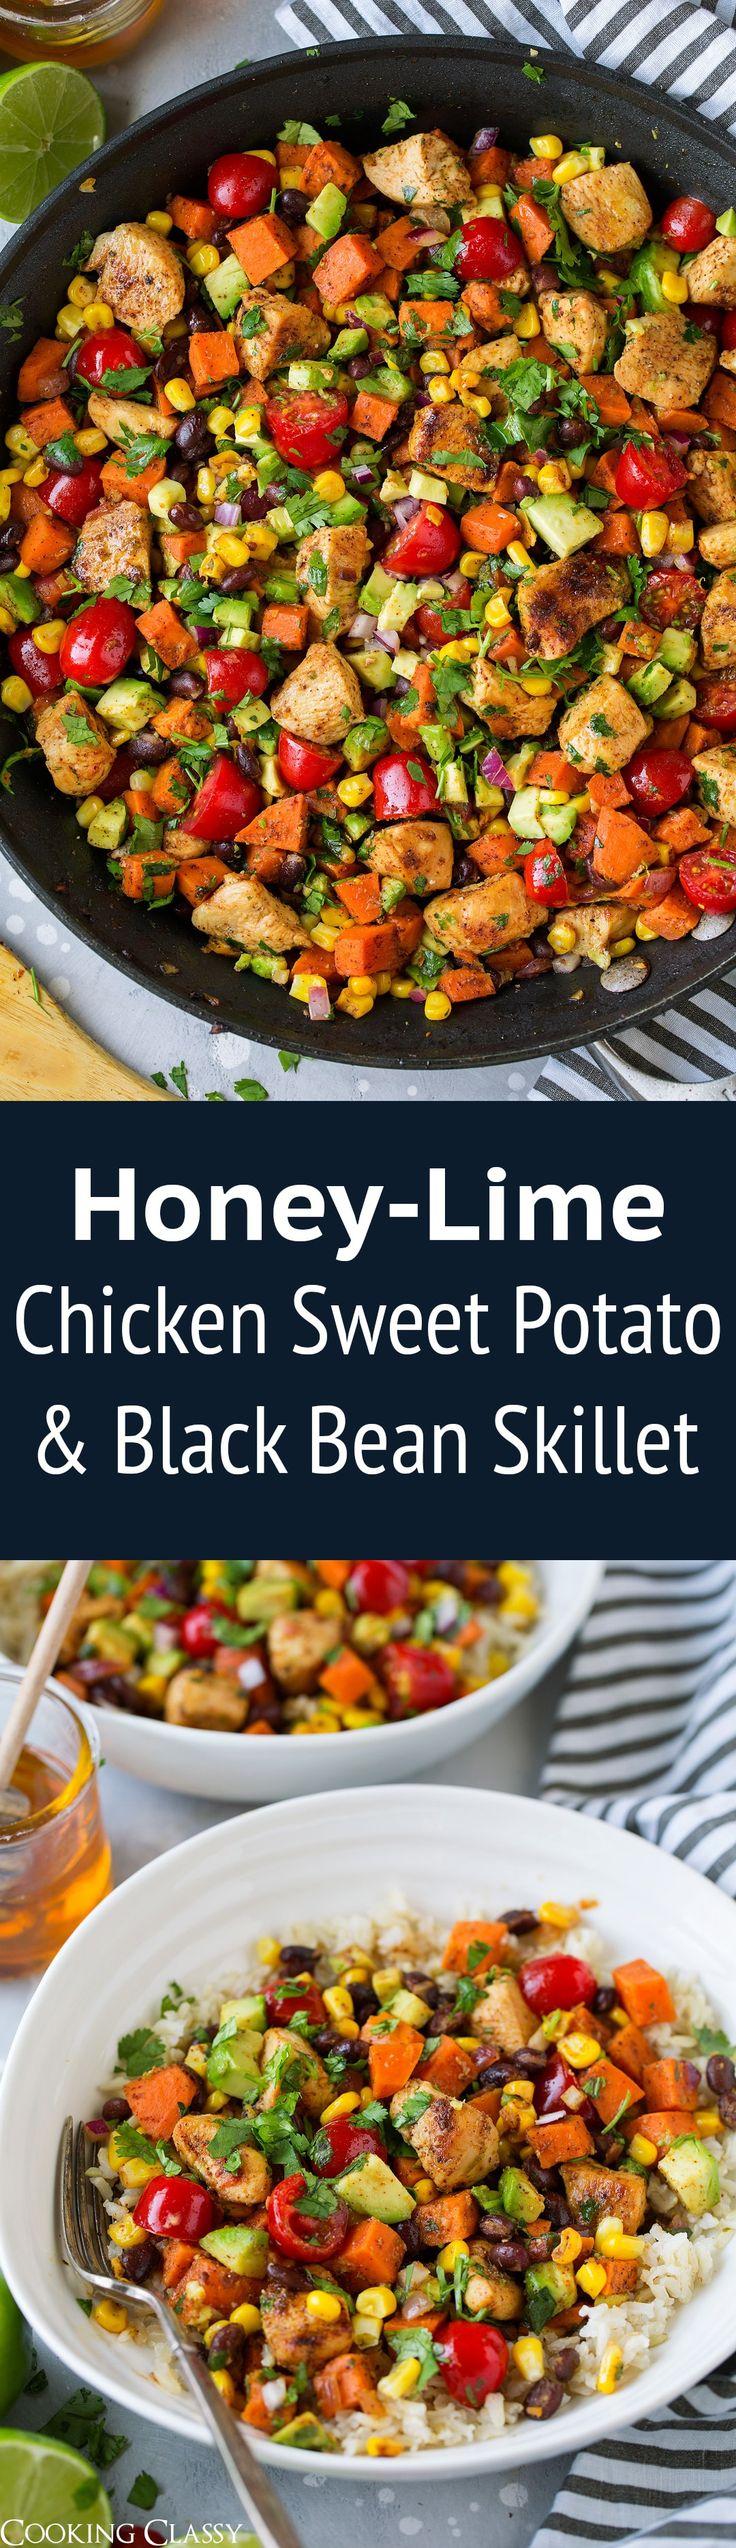 Honey Lime Chicken Sweet Potato and Black Bean Skillet - SO GOOD!!!